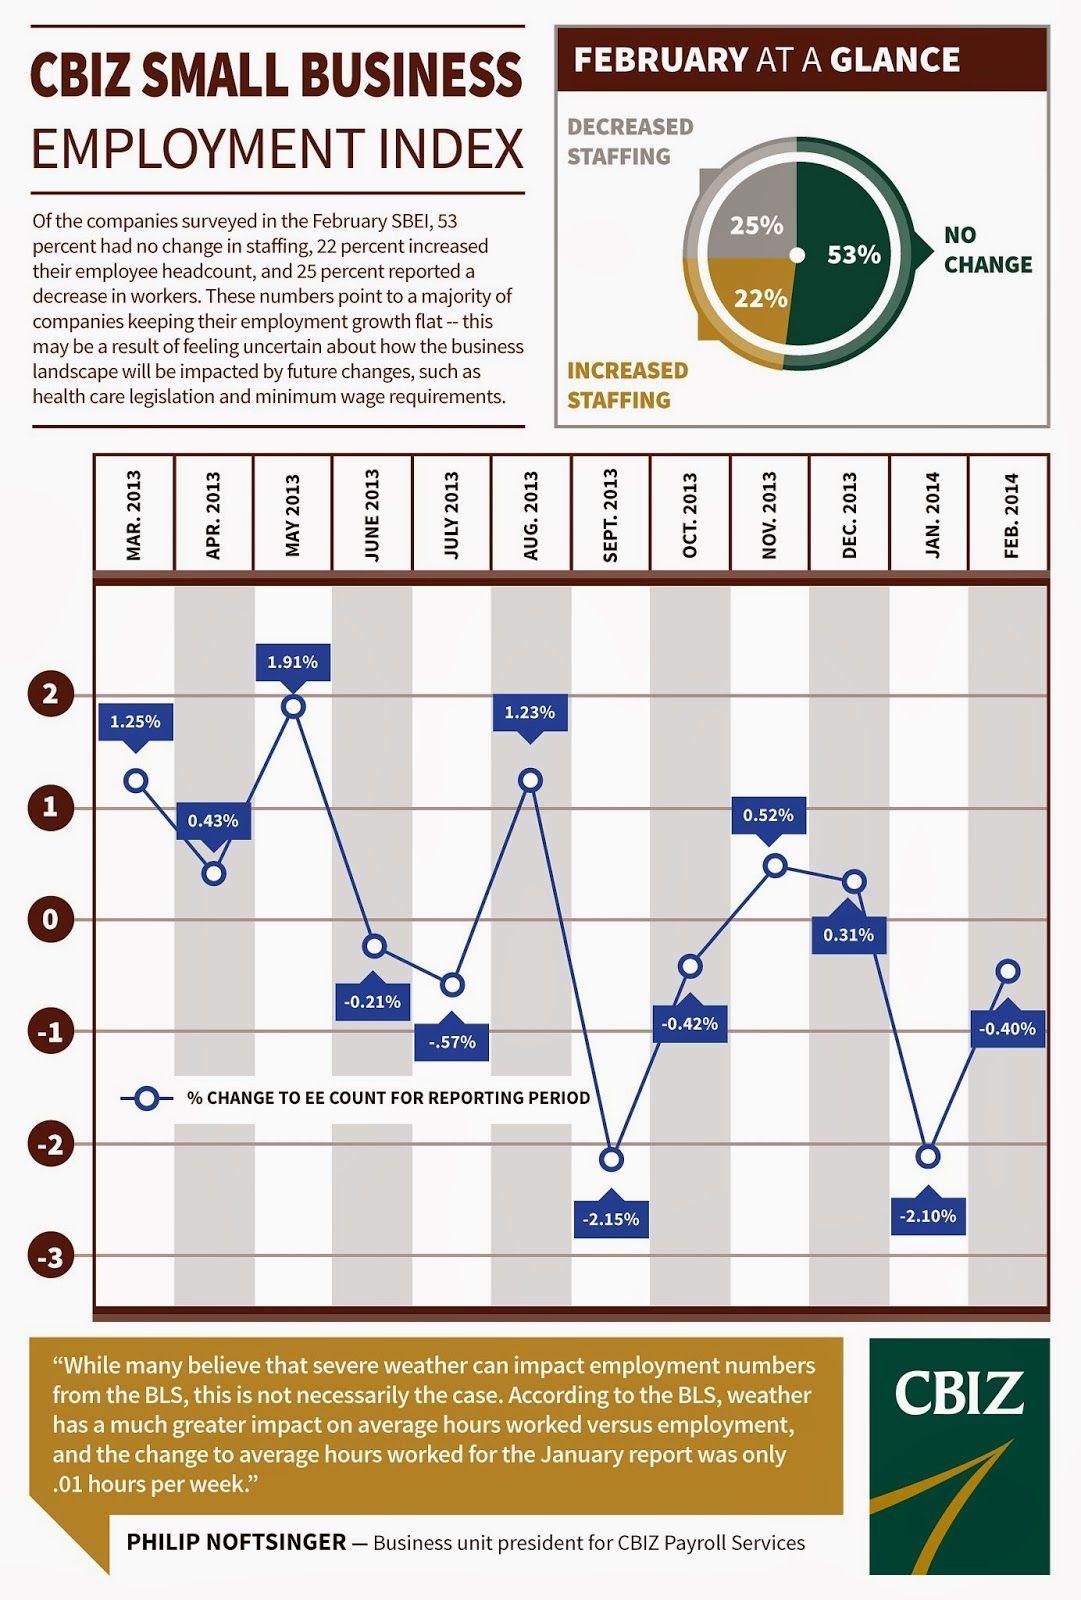 Slow start for 2014 hiring employment index